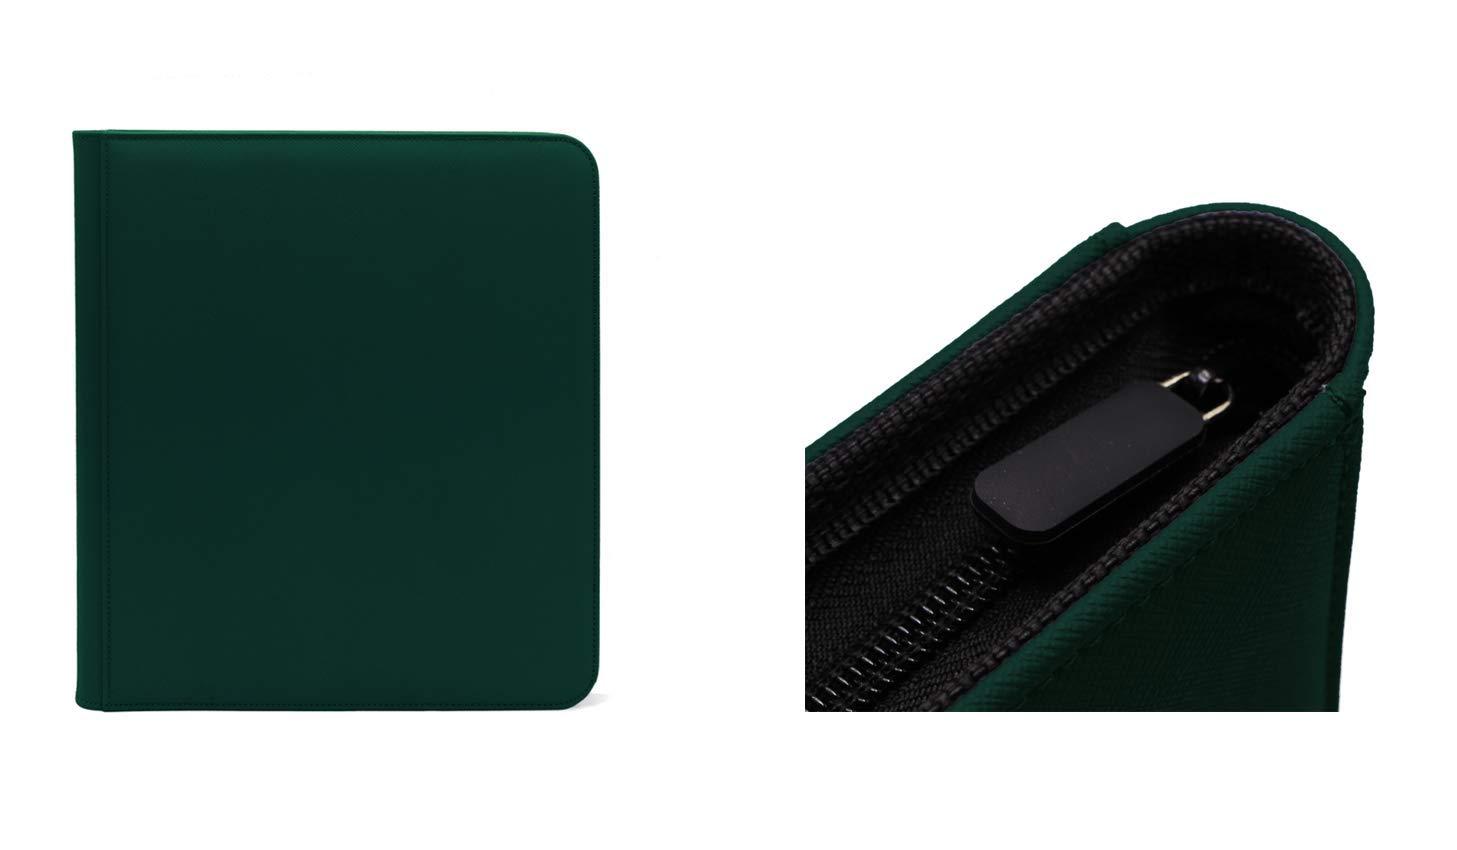 Grey Dex Protection Zip Binder 12 Pocket Card Storage Zipper Binder